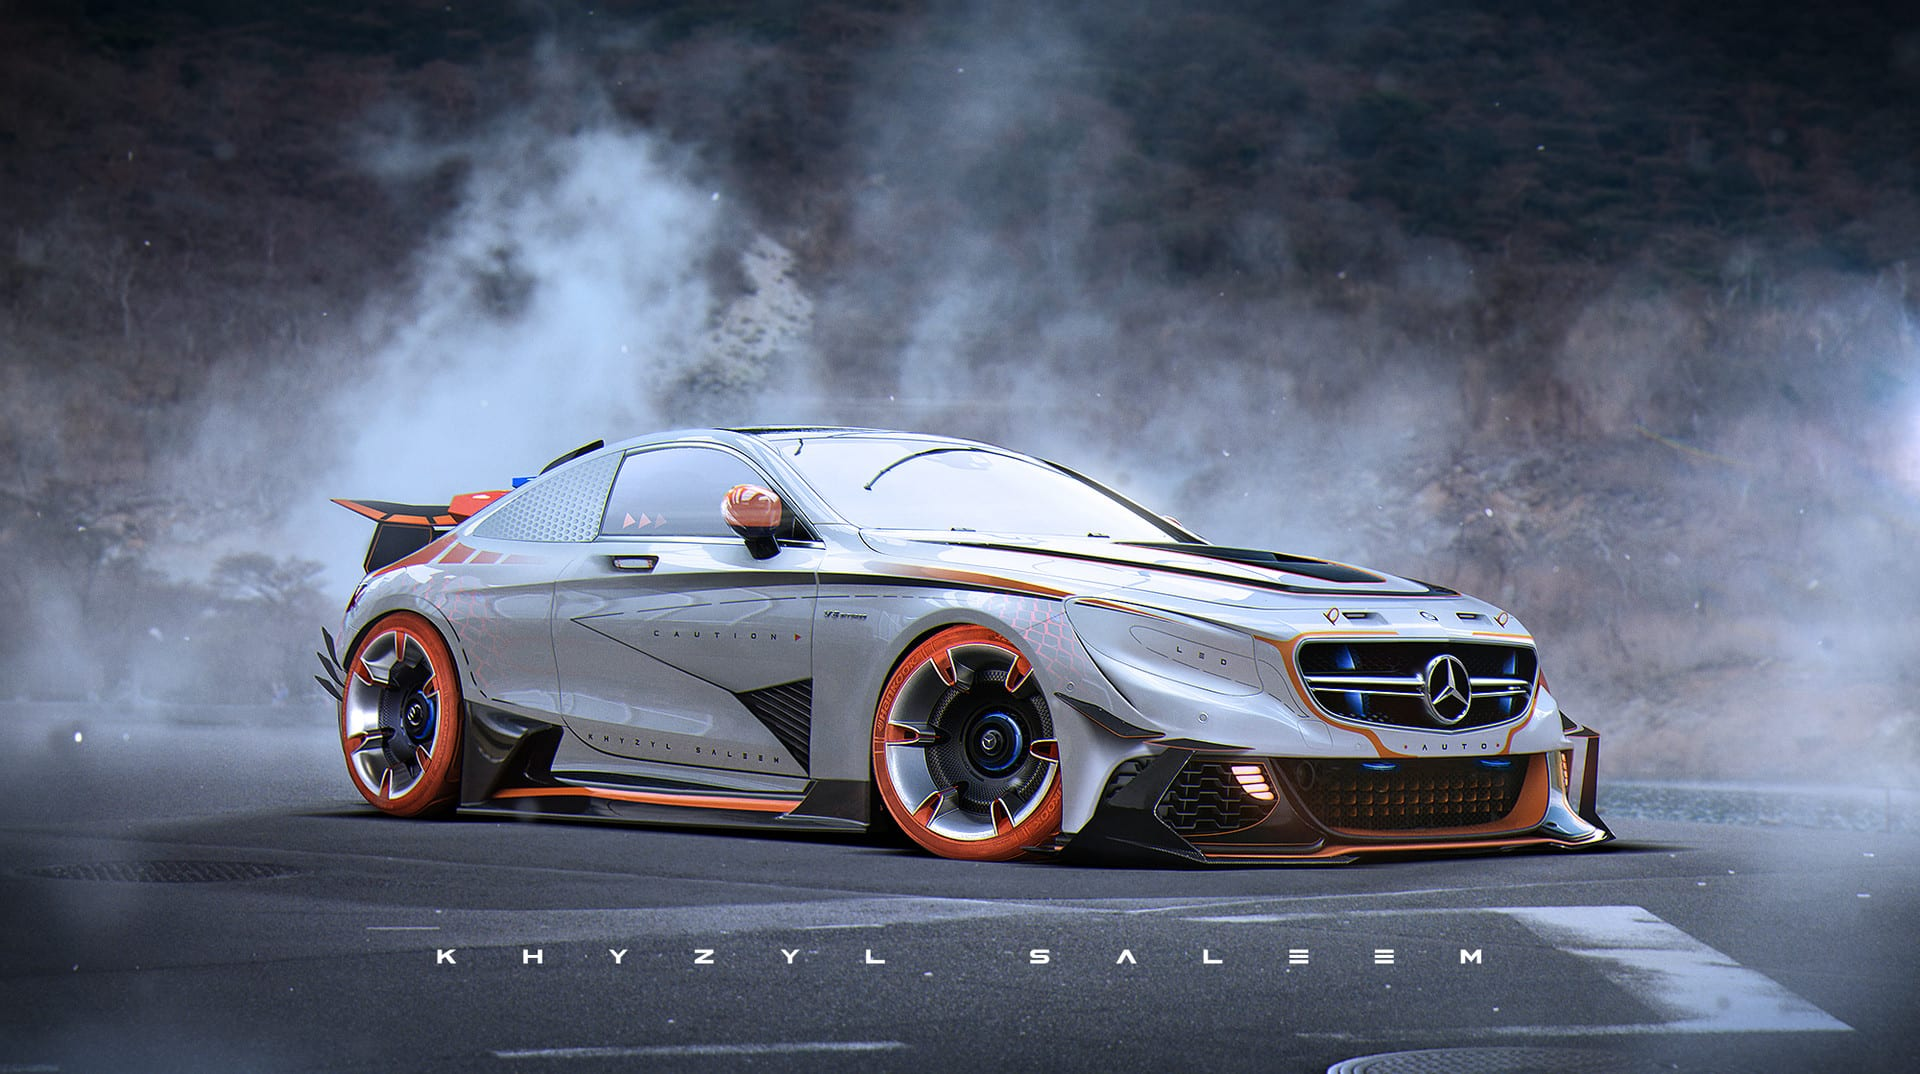 Mercedes creado por Khyzyl Saleem